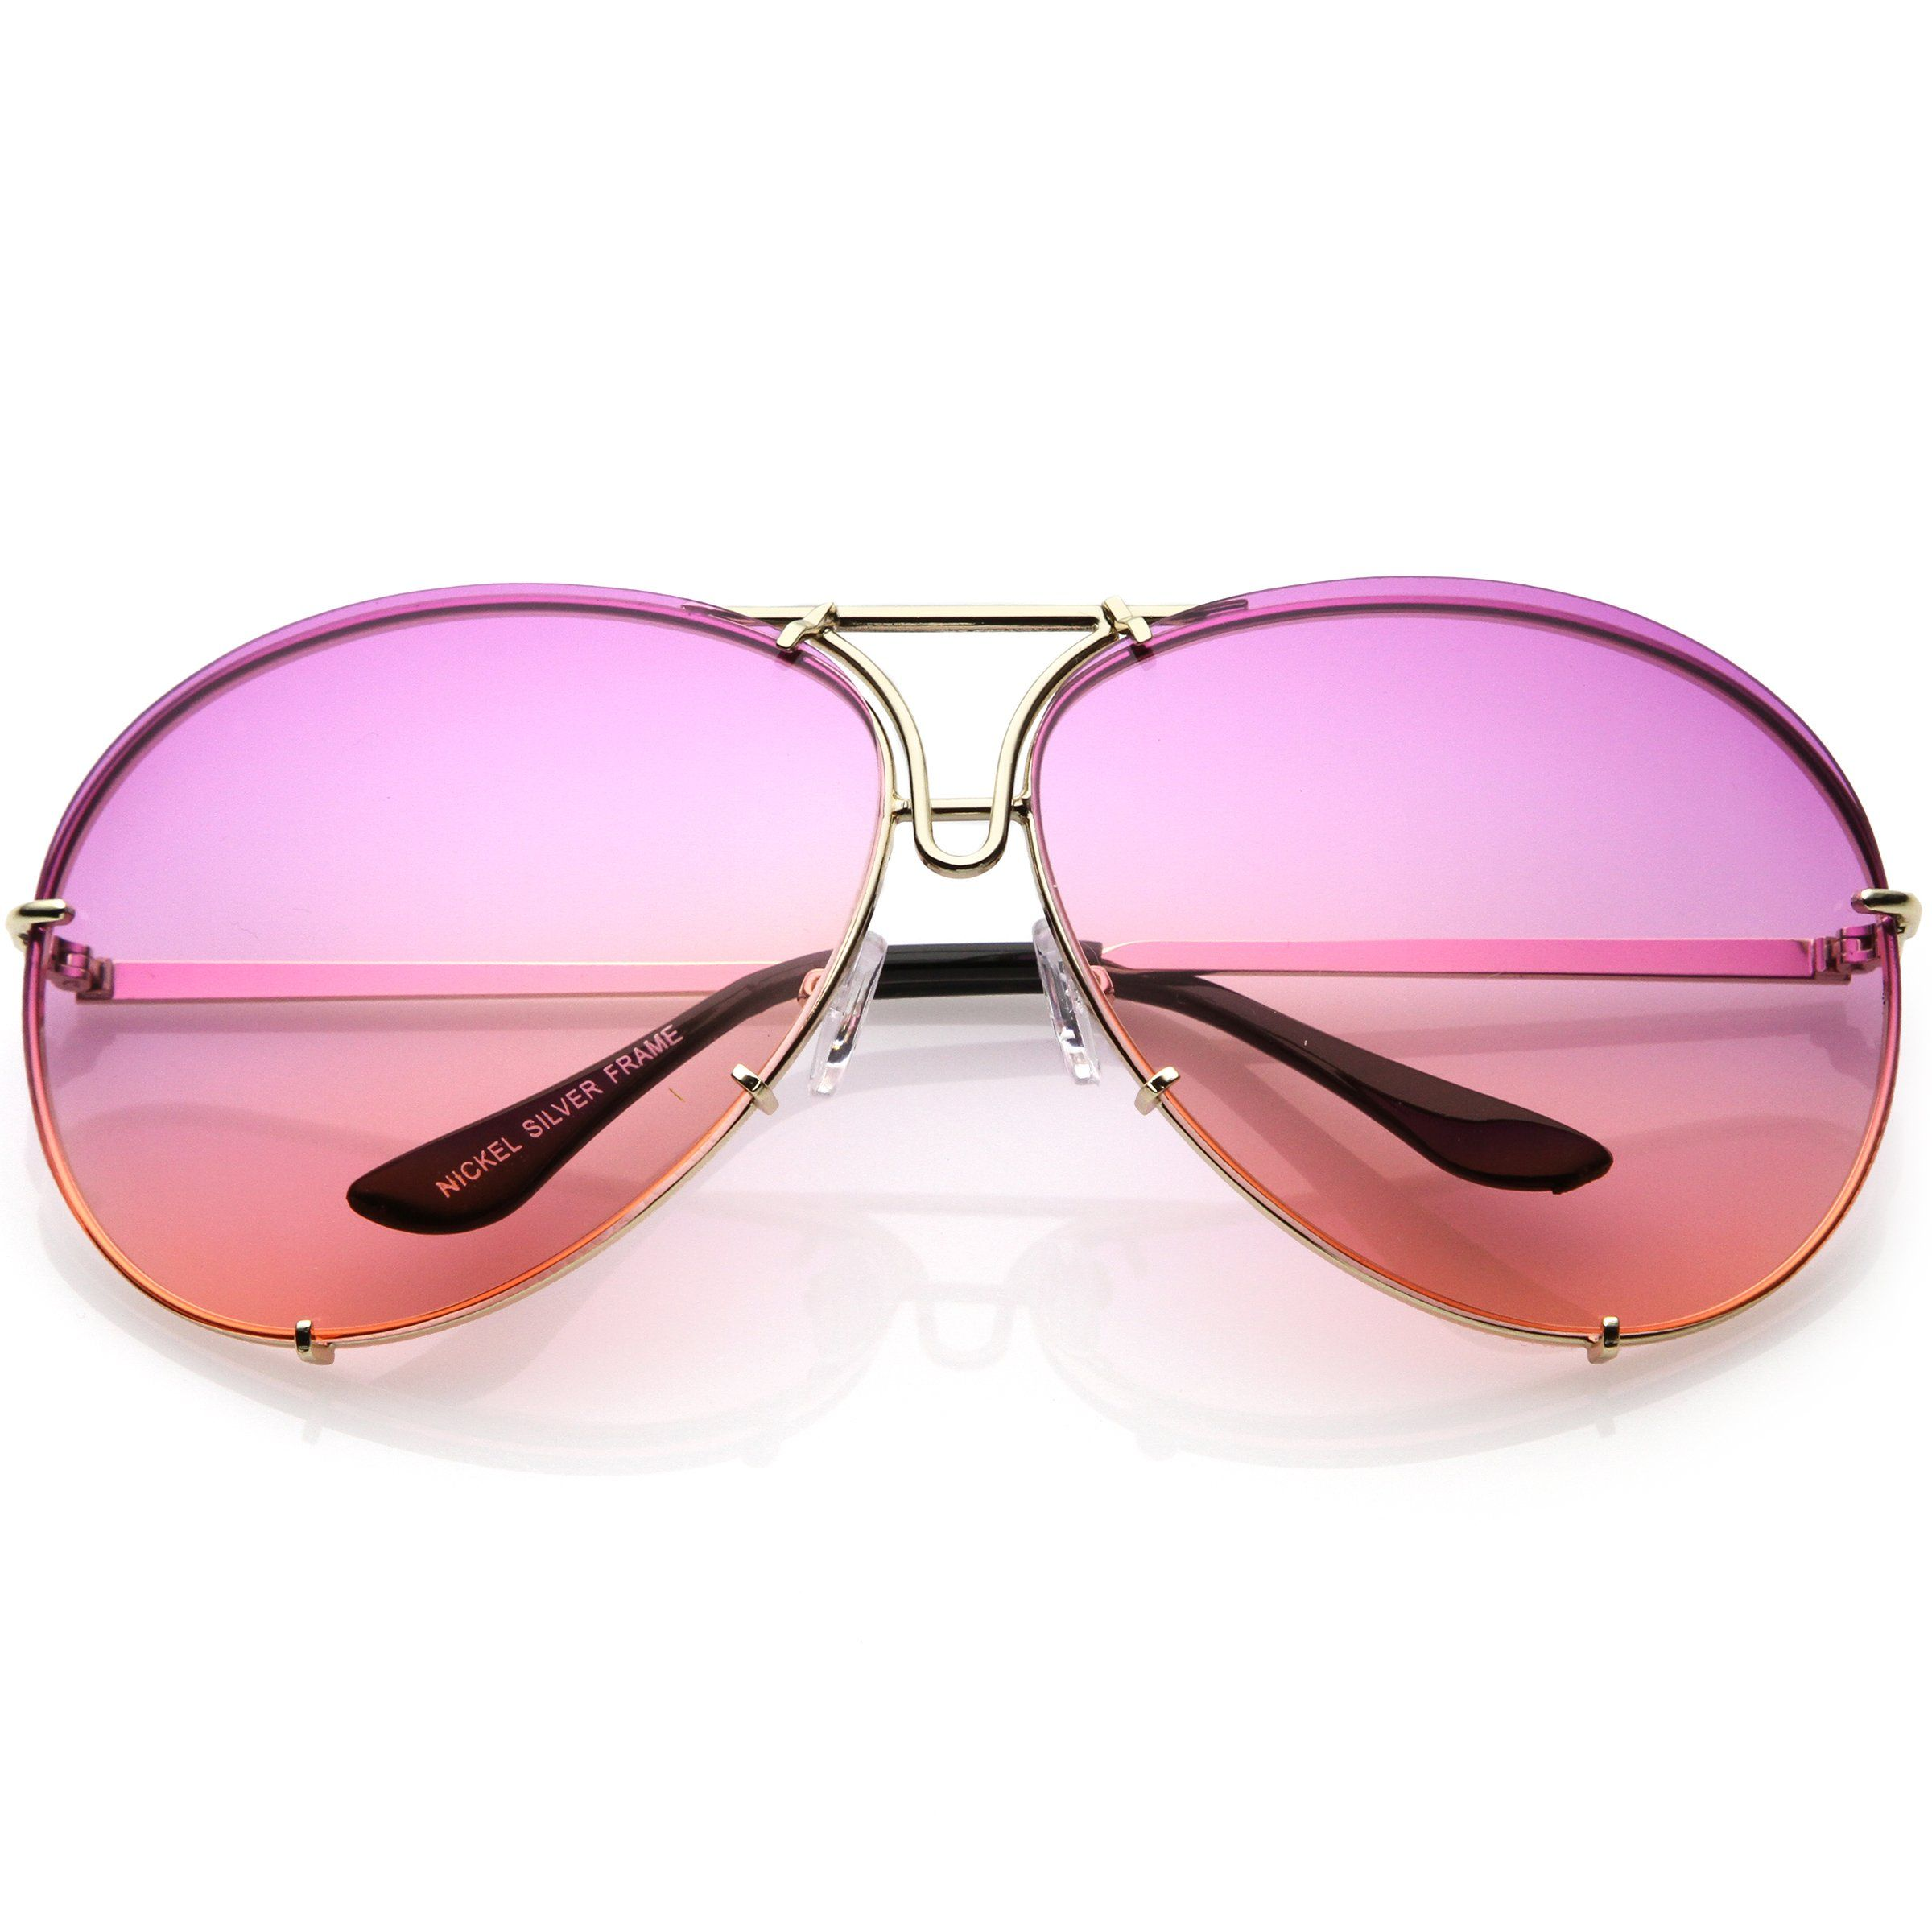 10fbb8ffa81 Retro Oversize Colorful Gradient Lens Aviator Sunglasses C336 ...